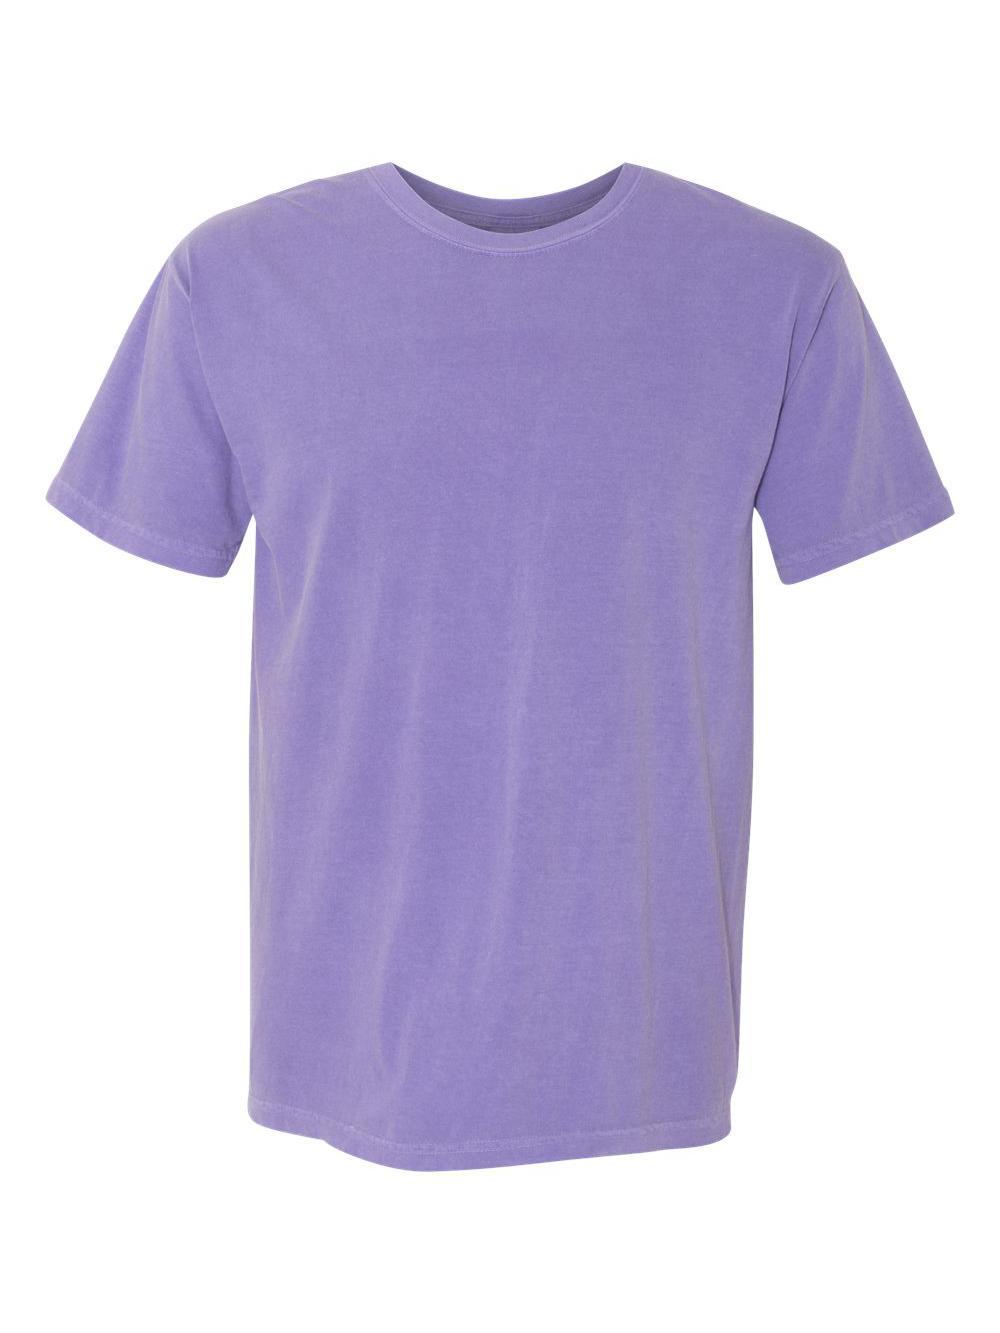 Comfort-Colors-Garment-Dyed-Heavyweight-Ringspun-Short-Sleeve-Shirt-1717 thumbnail 123